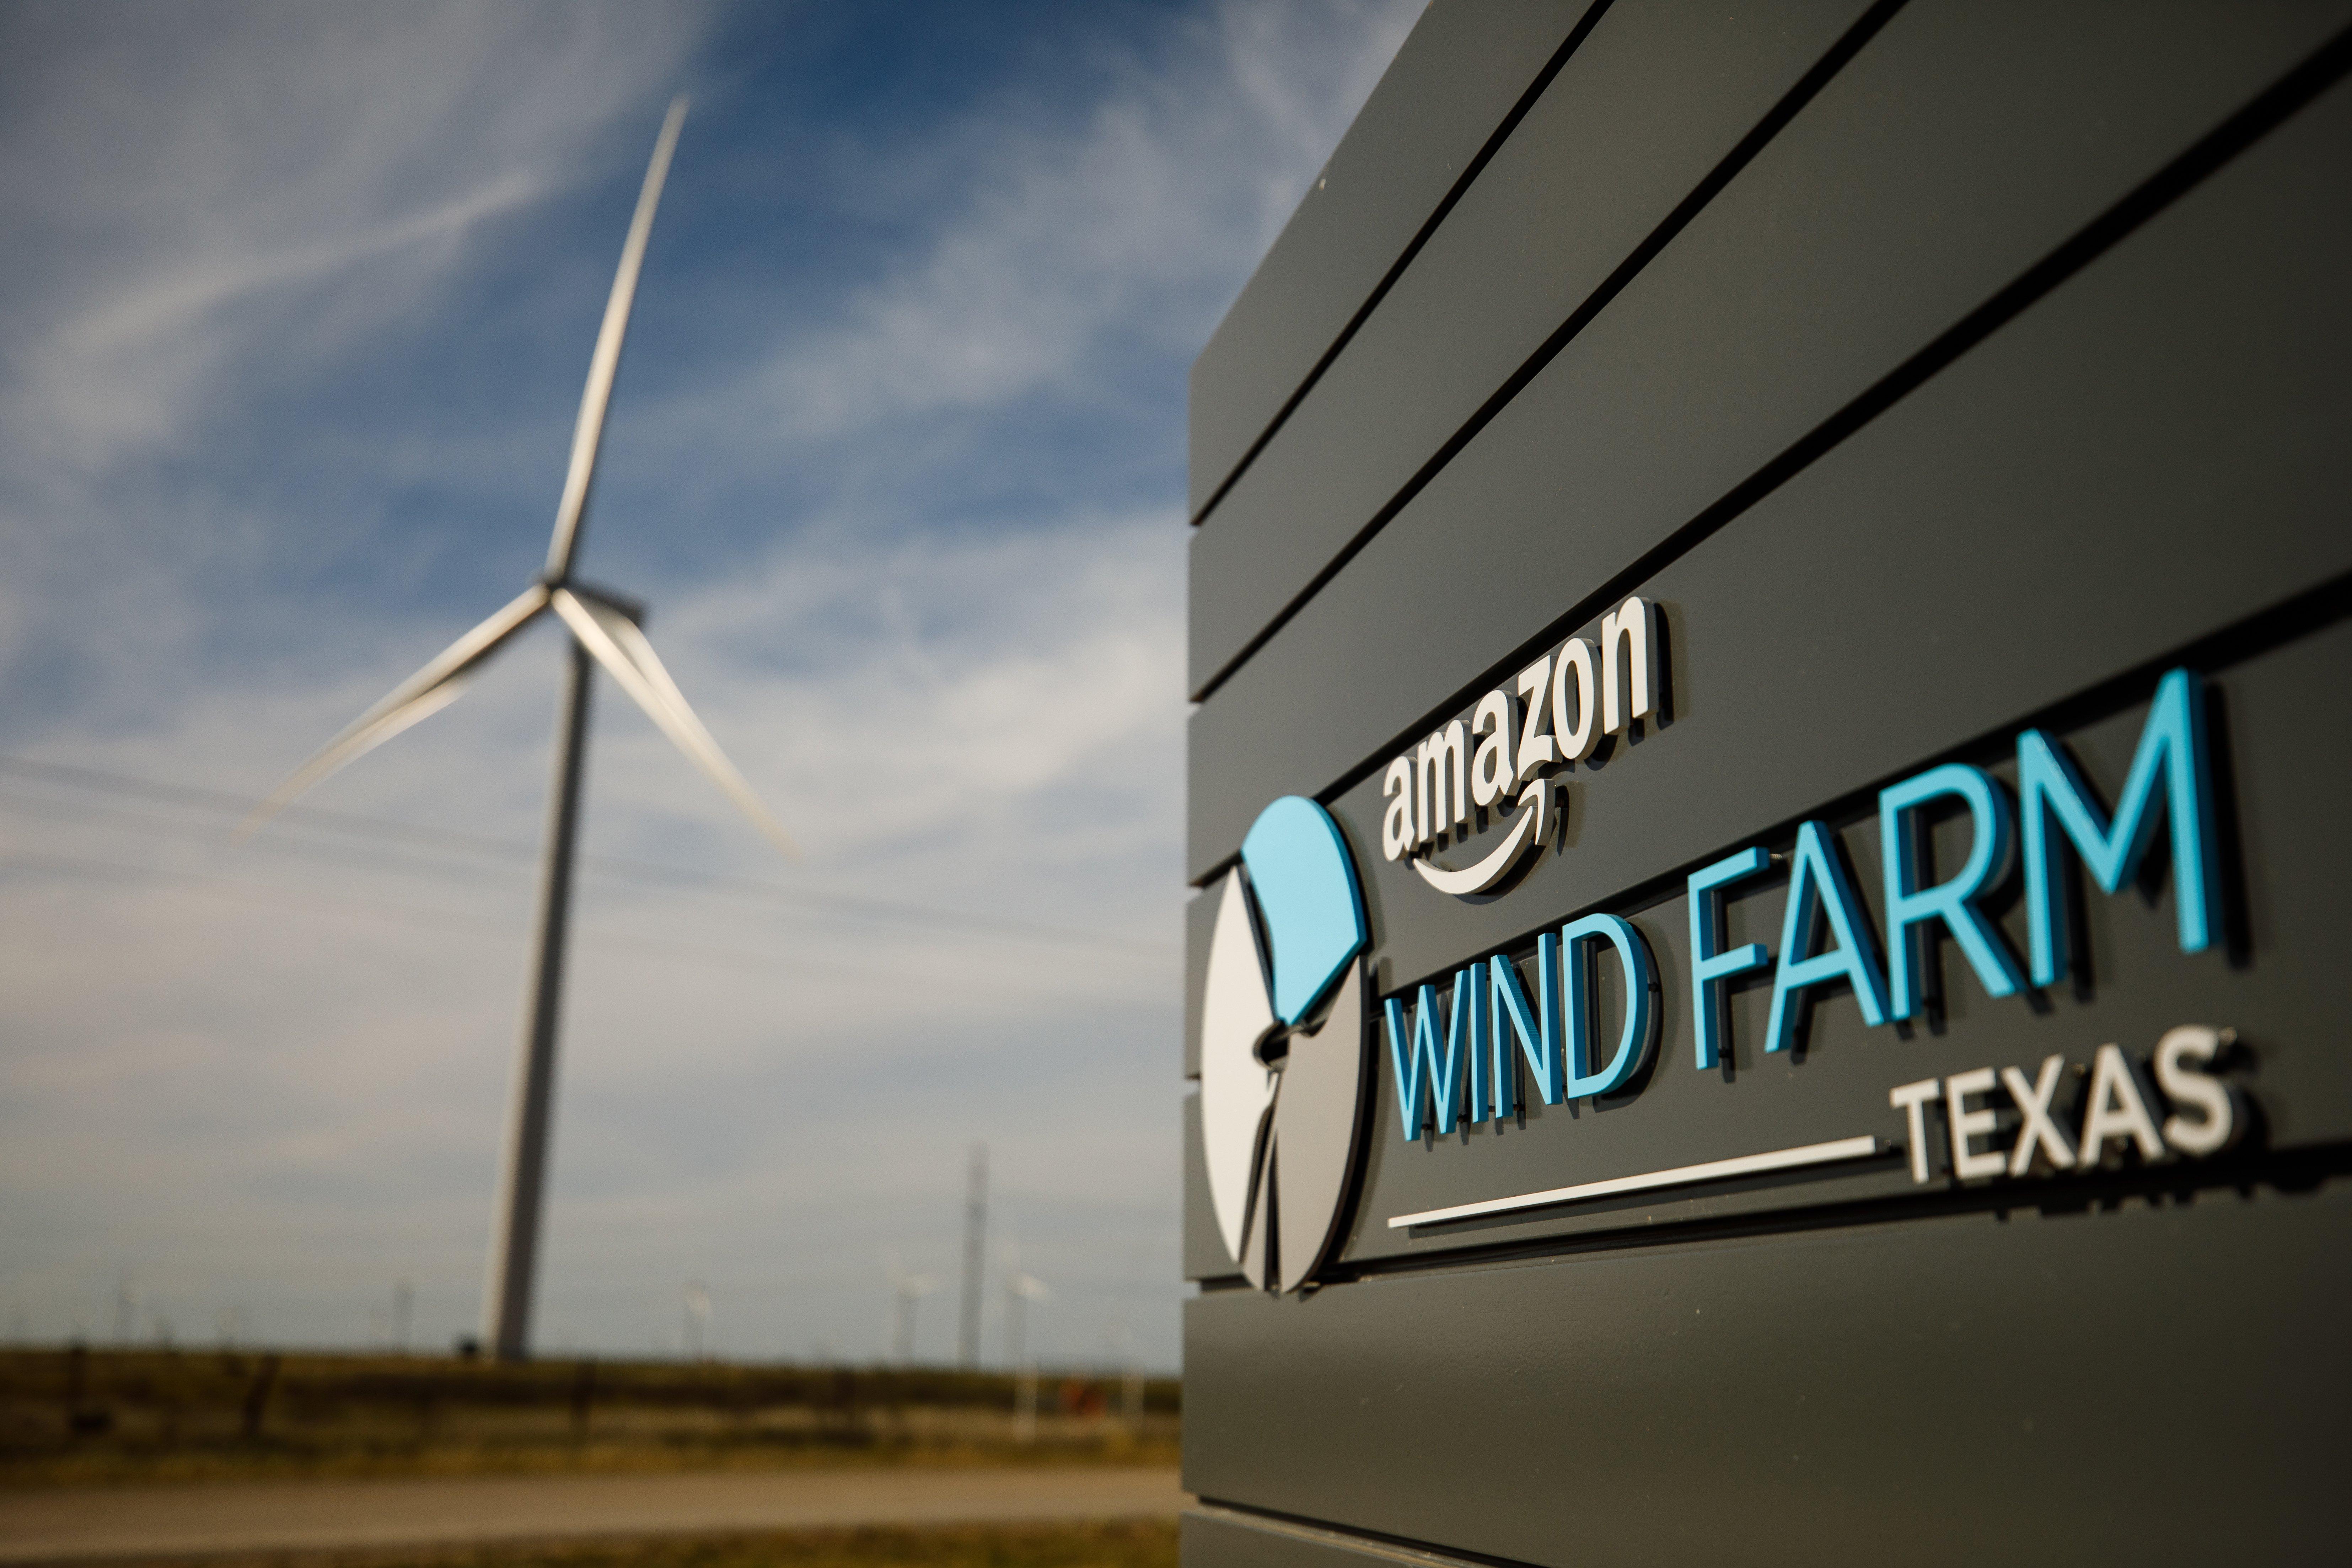 Amazon Wind Farm